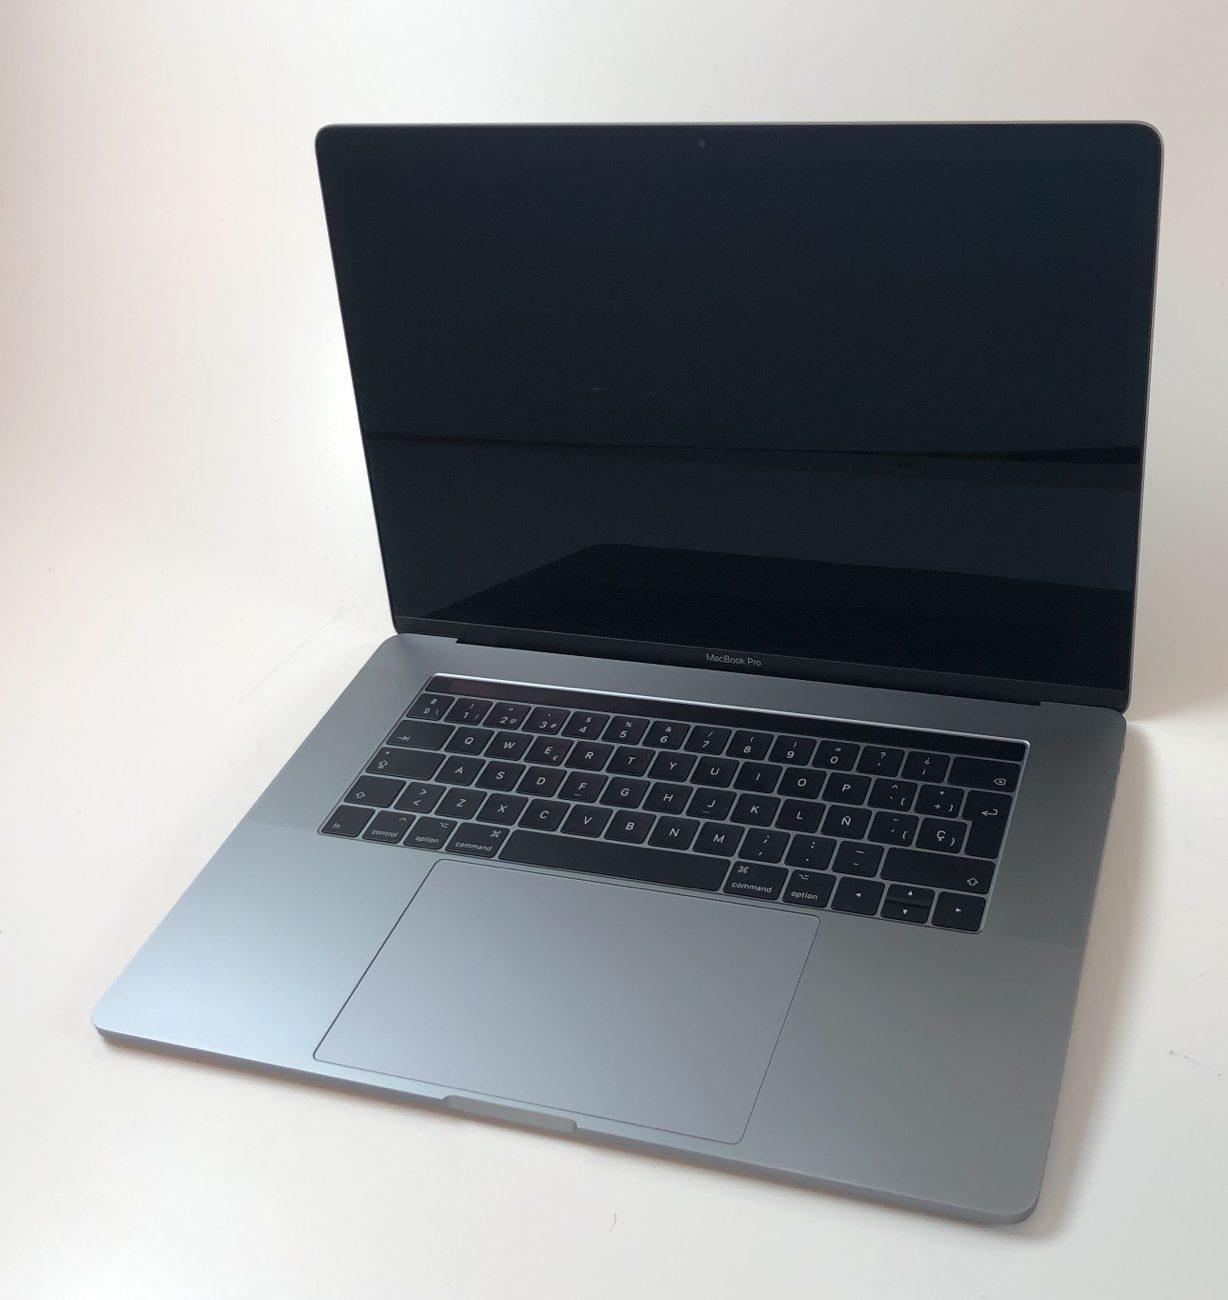 "MacBook Pro 15"" Touch Bar Mid 2017 (Intel Quad-Core i7 2.8 GHz 16 GB RAM 1 TB SSD), Space Gray, Intel Quad-Core i7 2.8 GHz, 16 GB RAM, 1 TB SSD, imagen 1"